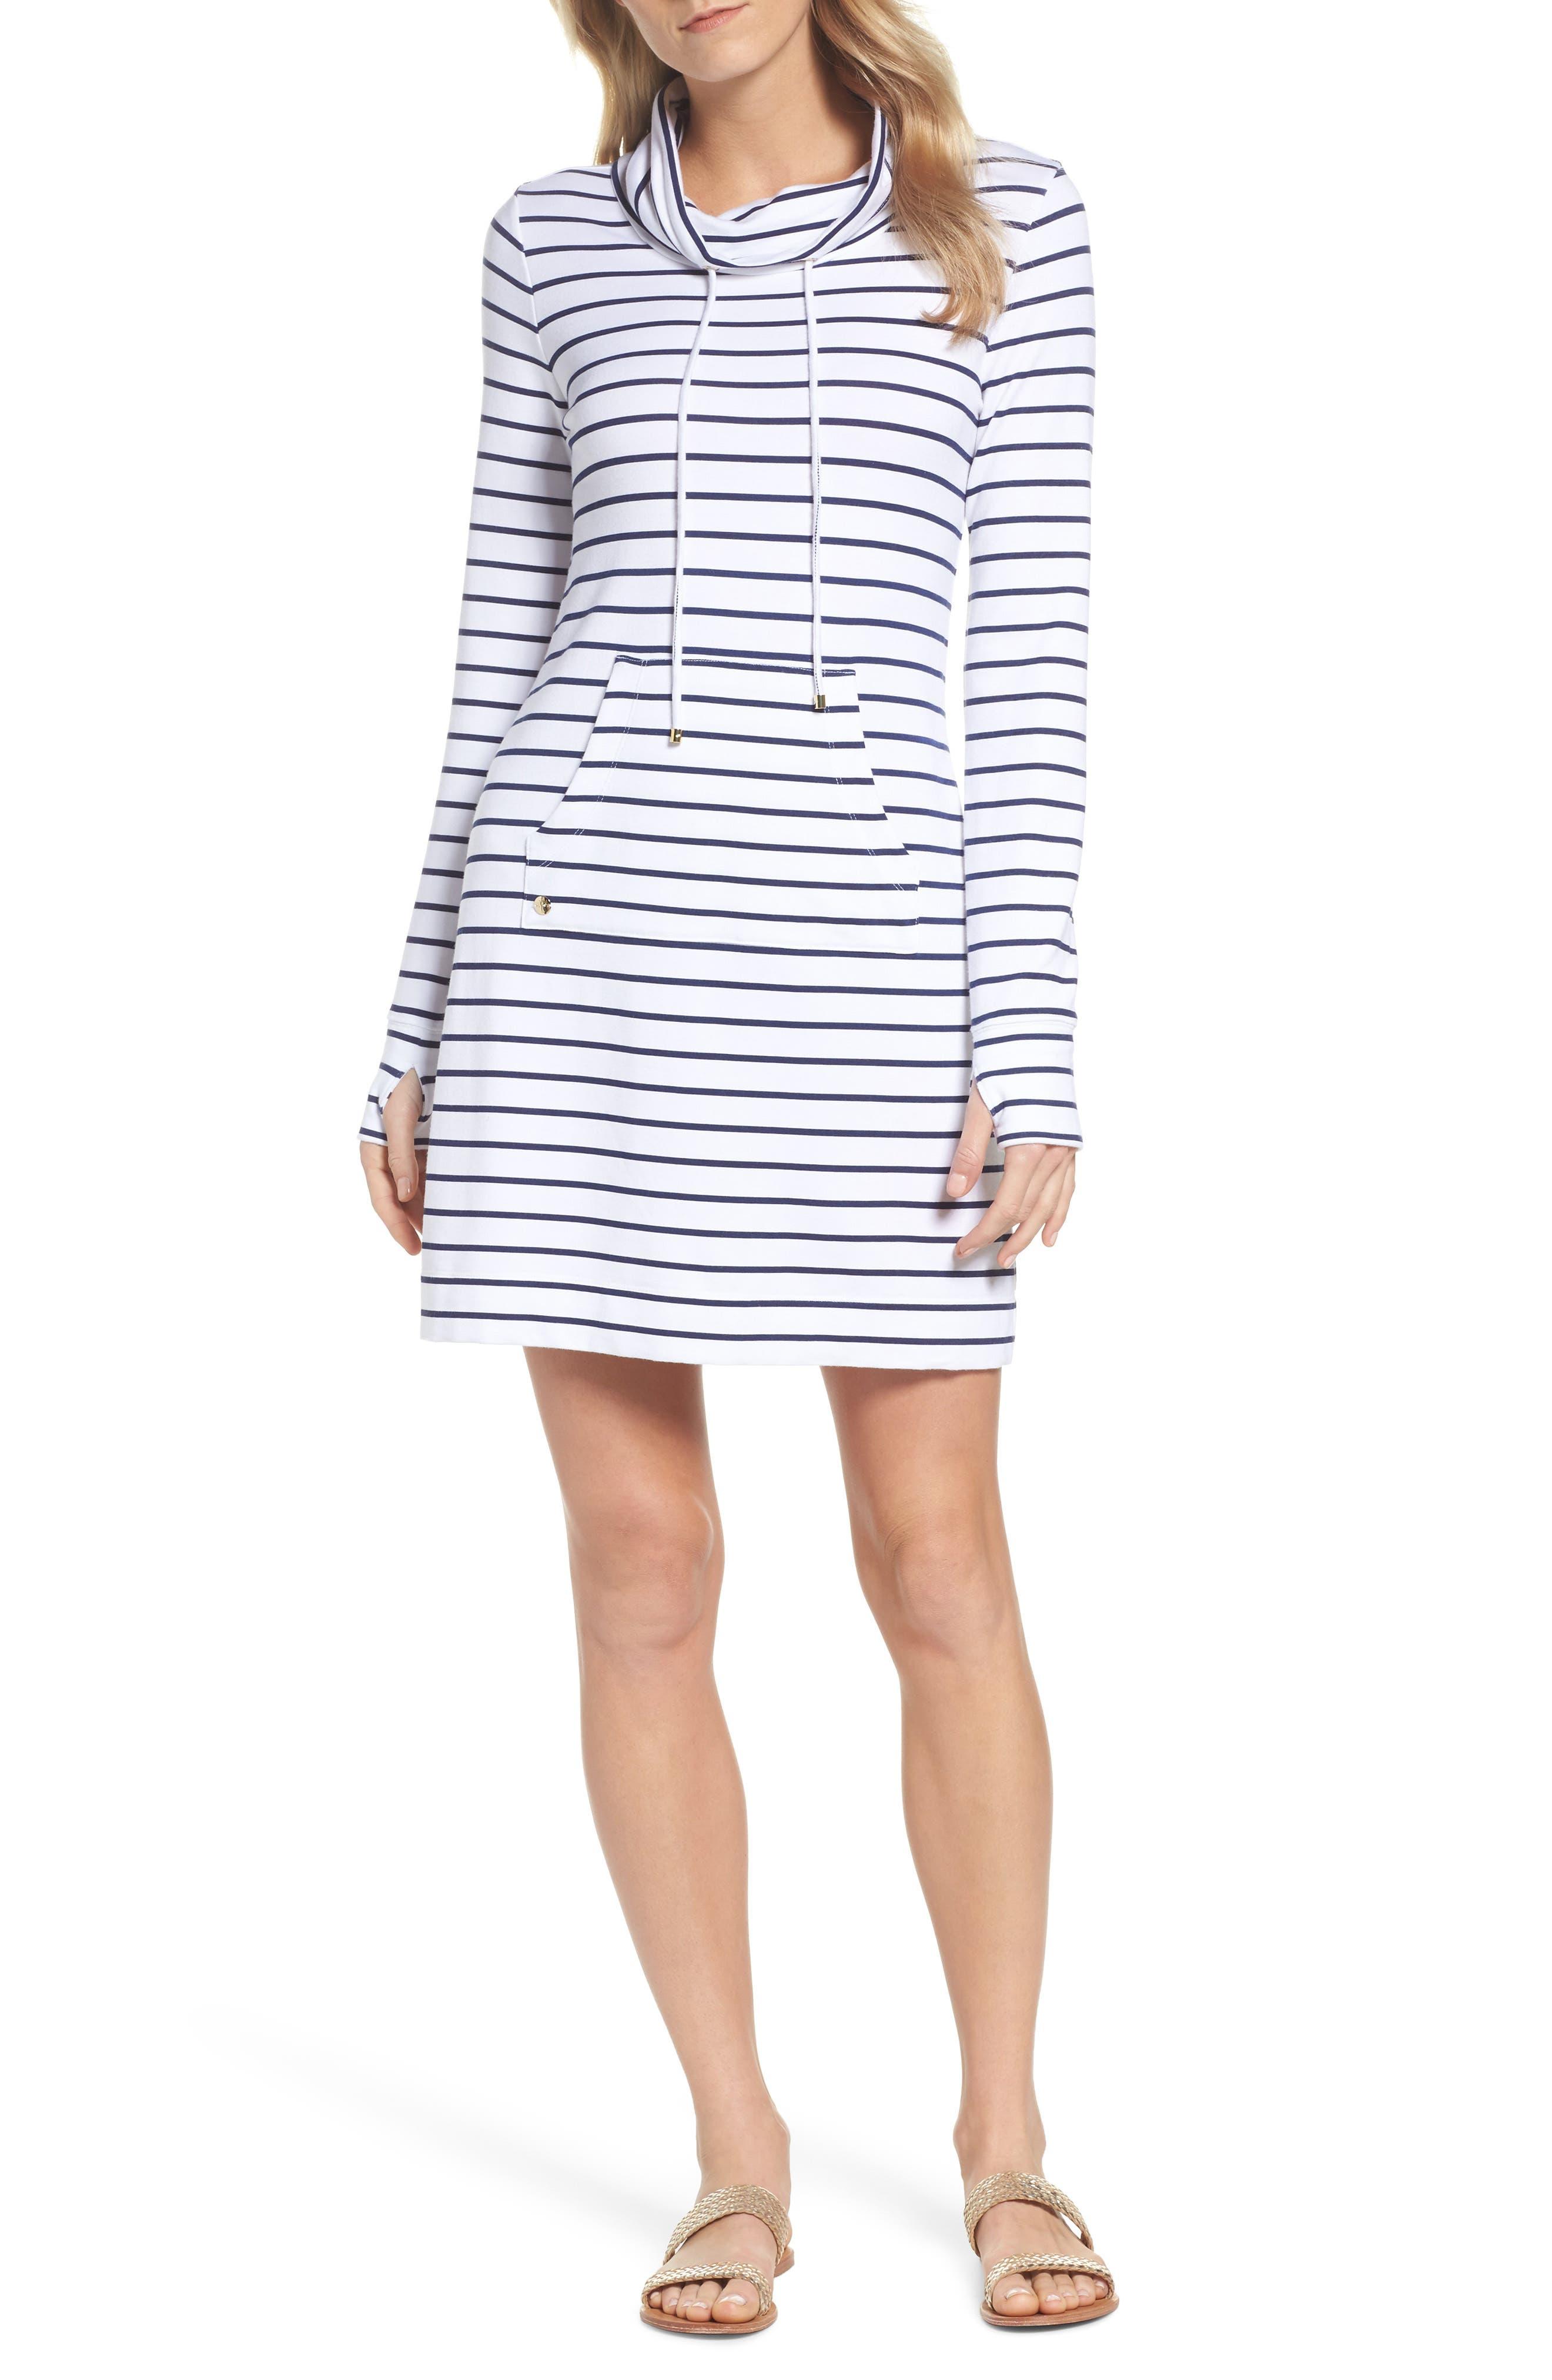 Main Image - Lilly Pulitzer® Hilary UPF 50+ Dress